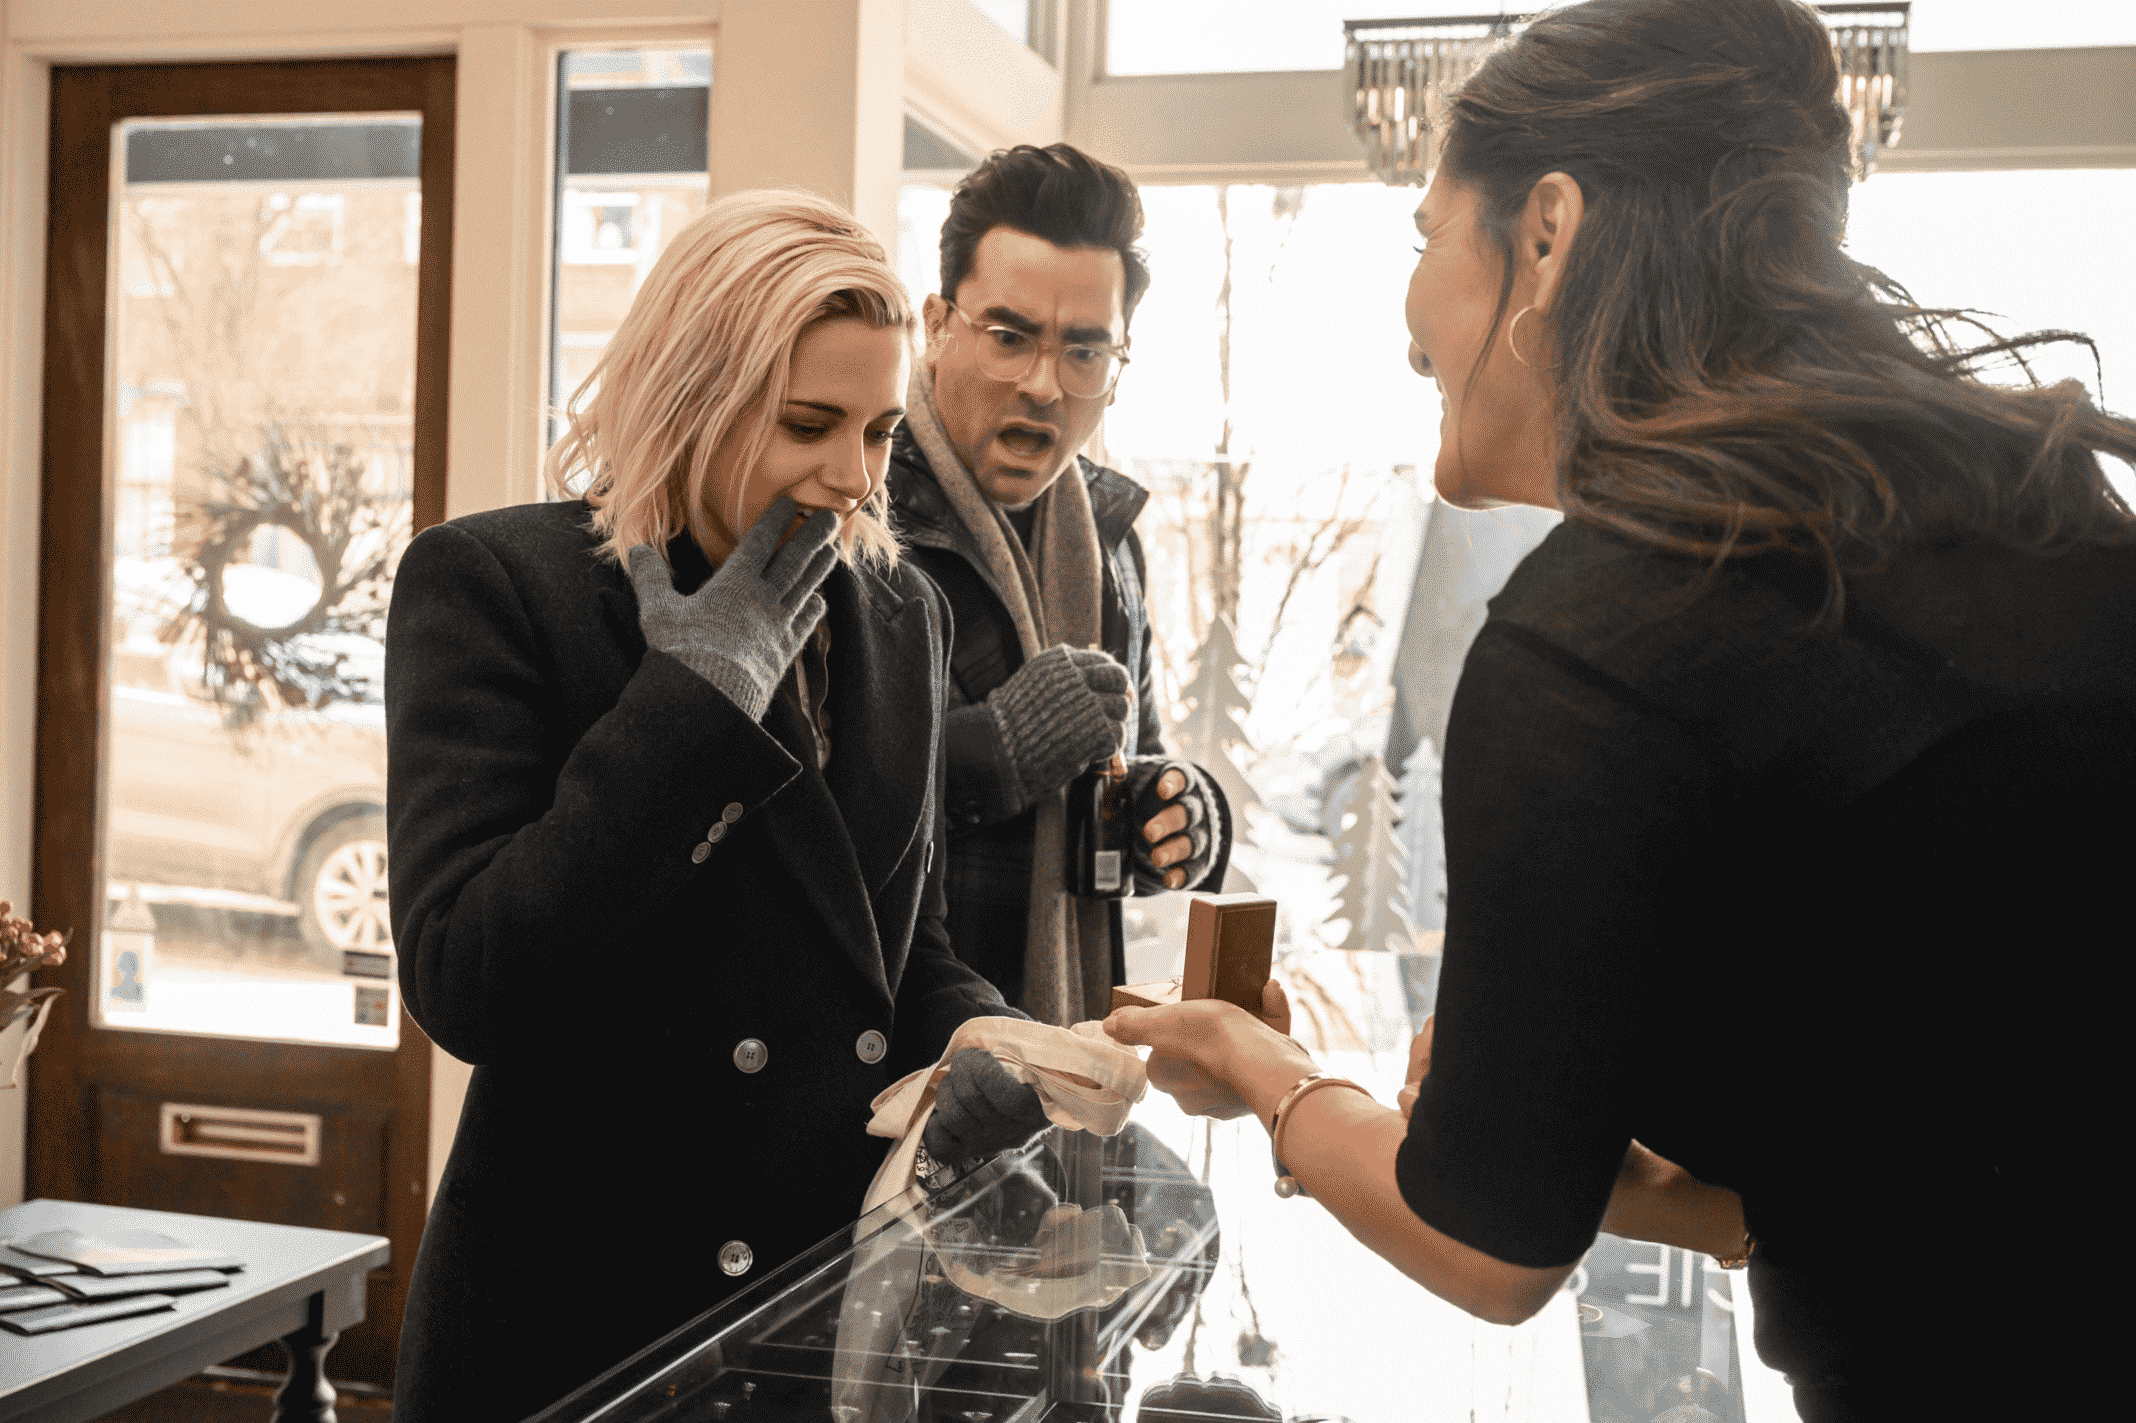 The Jeweler (SARAB KAMOO) shows Abby (KRISTEN STEWART) rings with John (DAN LEVY)